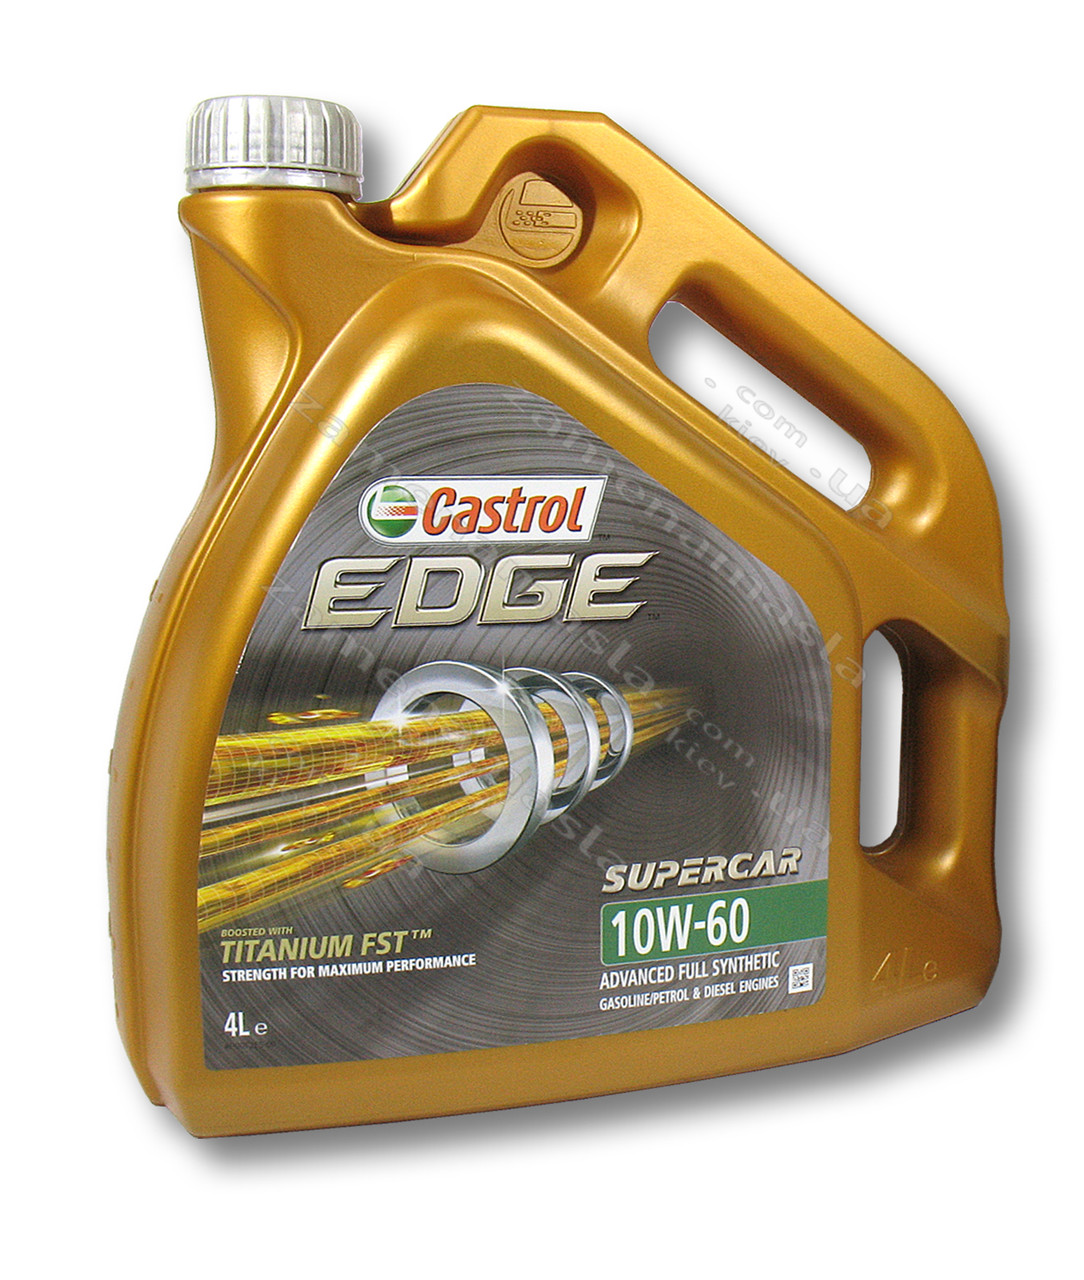 Castrol EDGE Titanium FST SUPERCAR 10W-60 4л - моторное масло